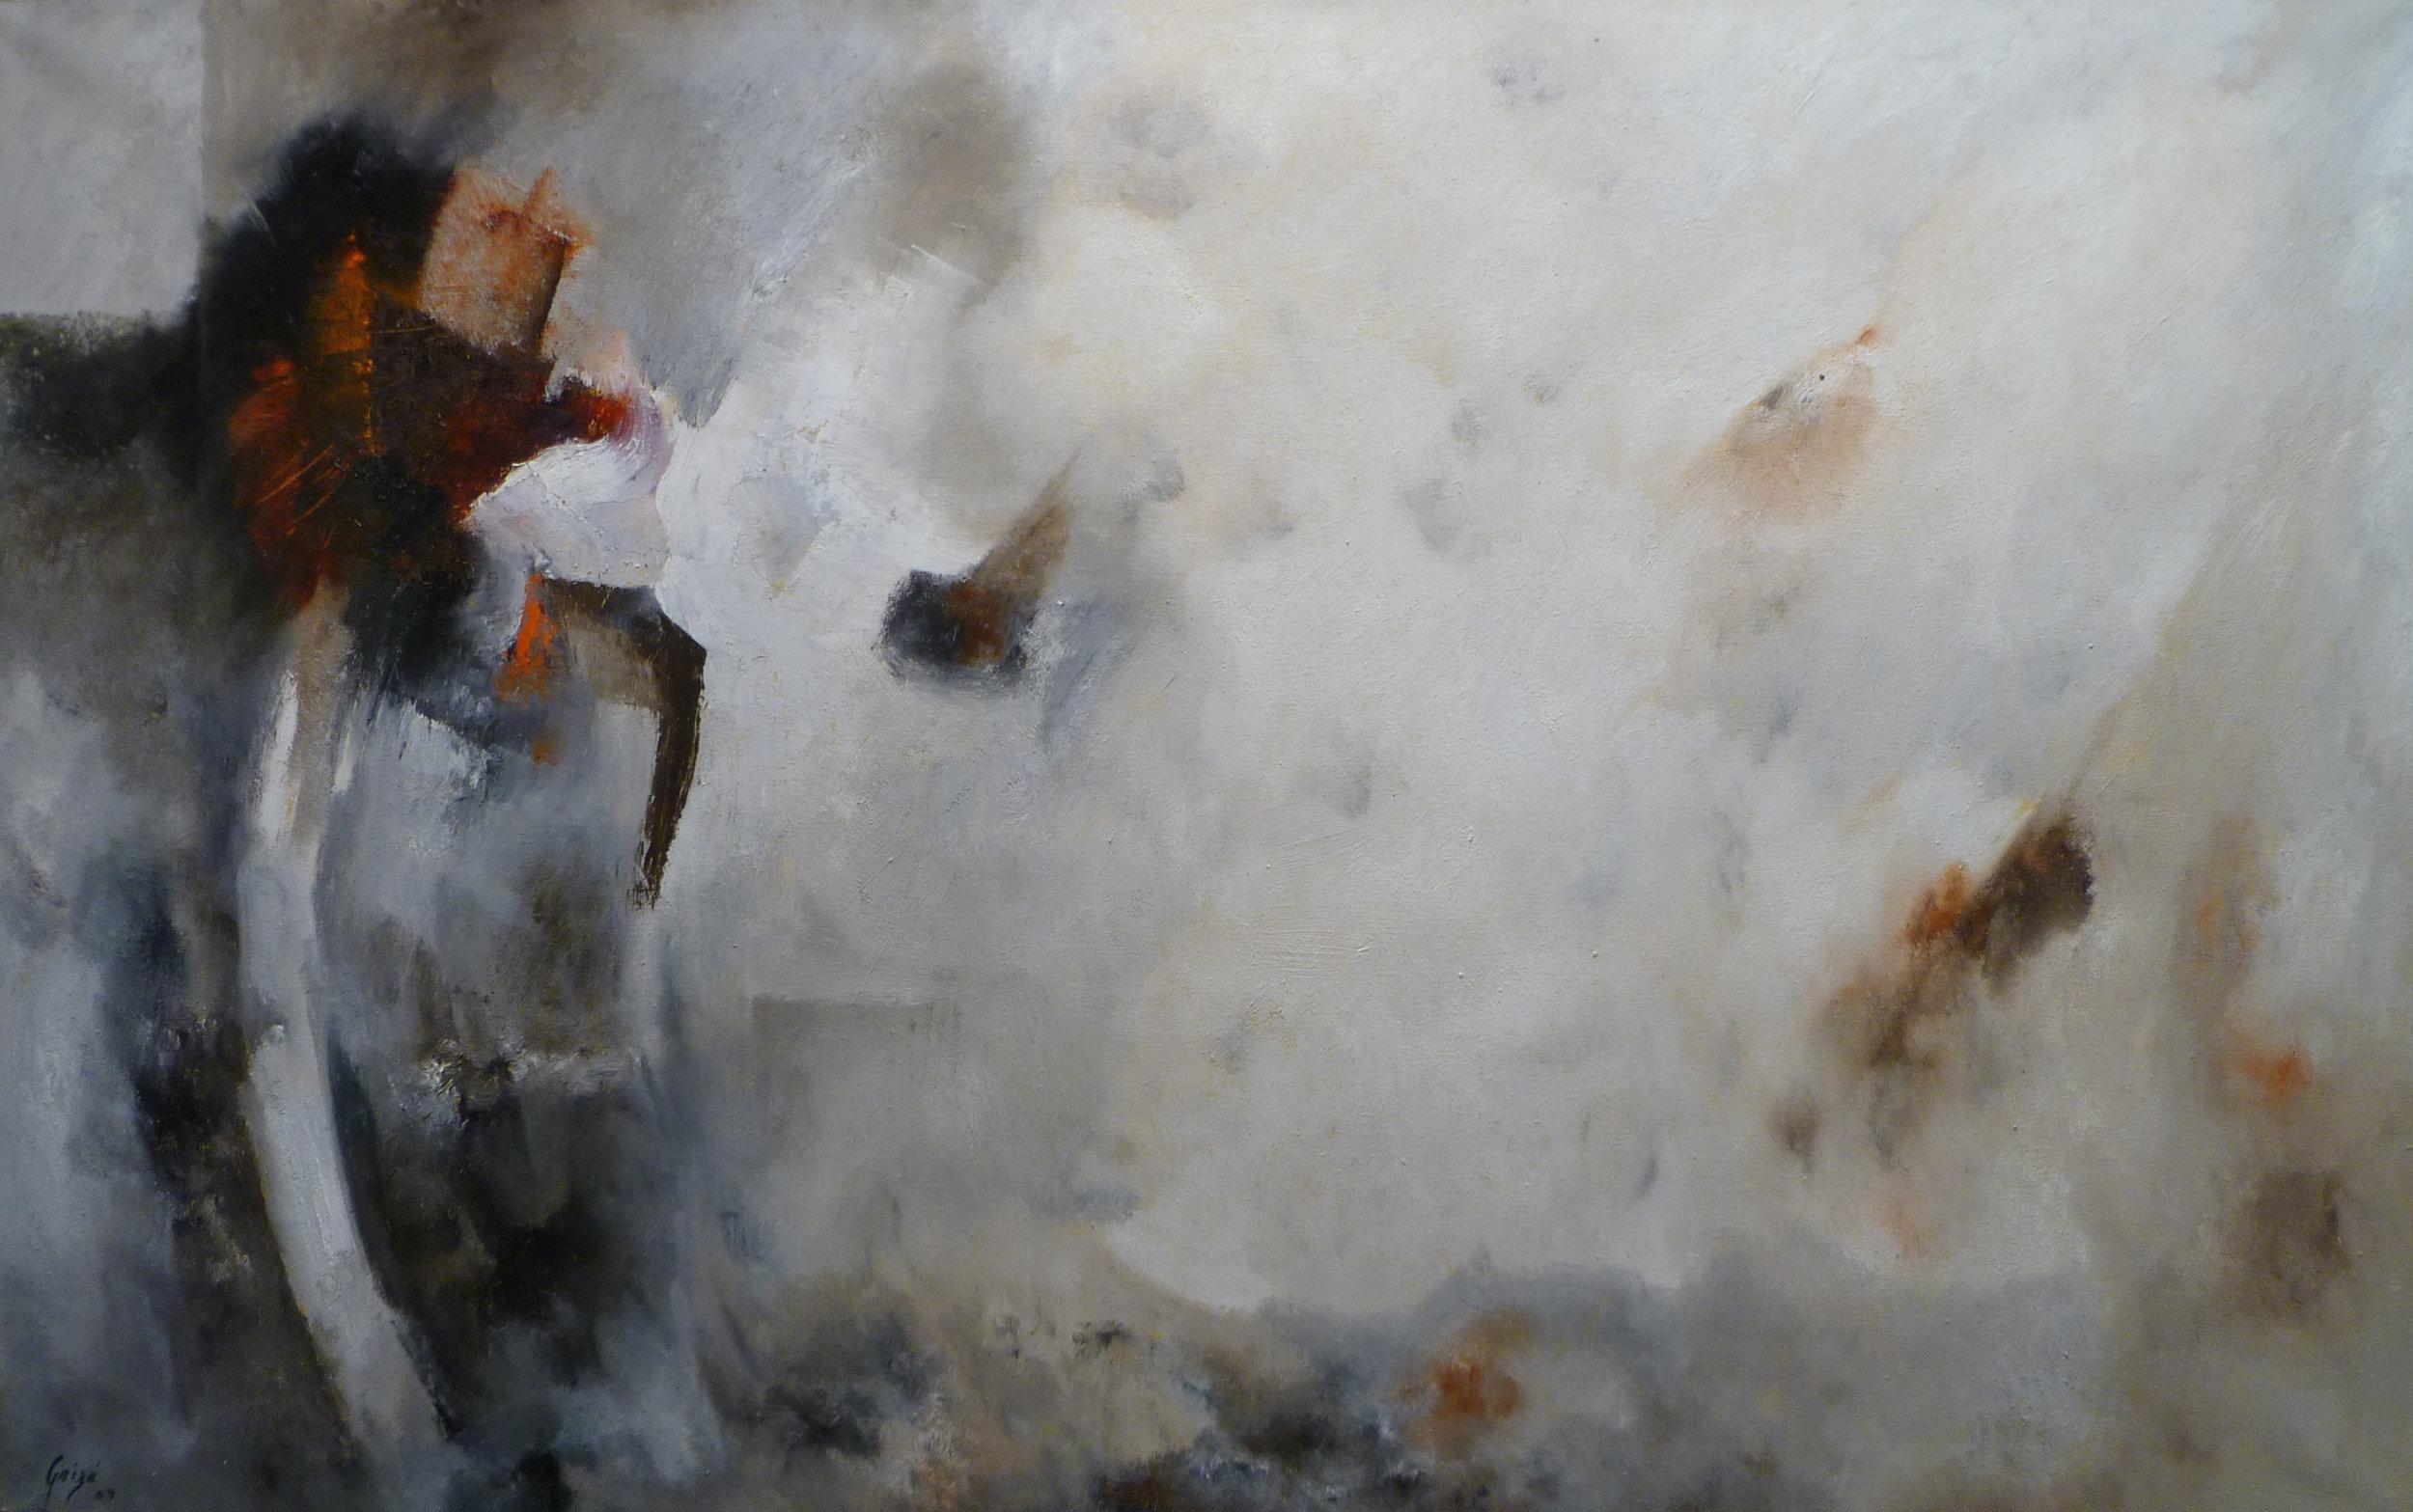 13 Entre escombros anónimos 100 x 160 cm 2009 copy.JPG